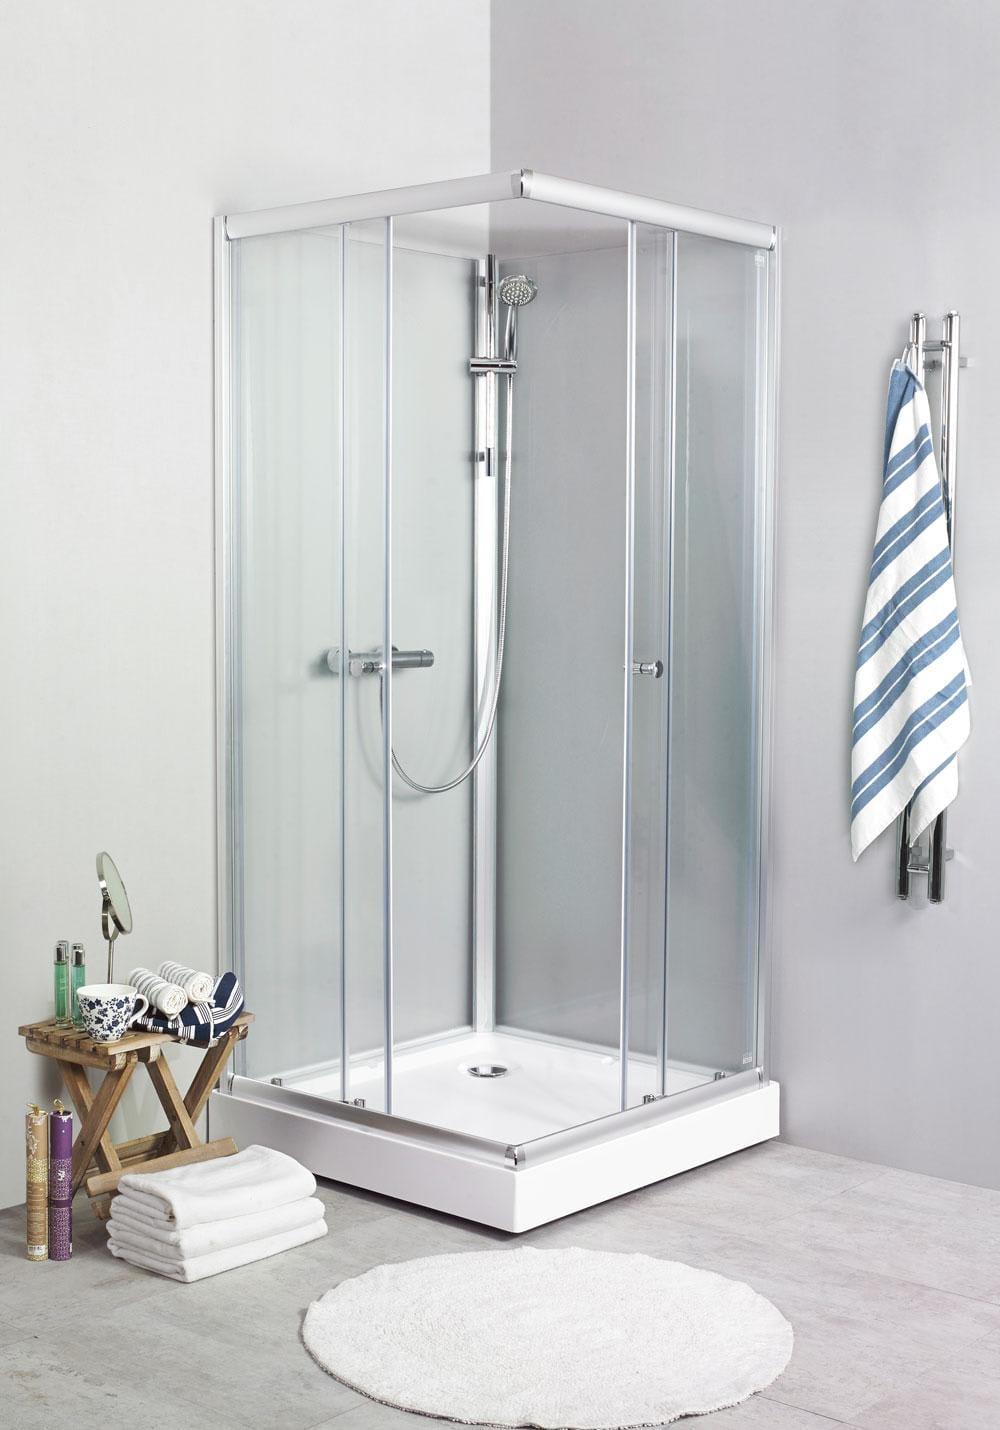 70x90 duschkabin